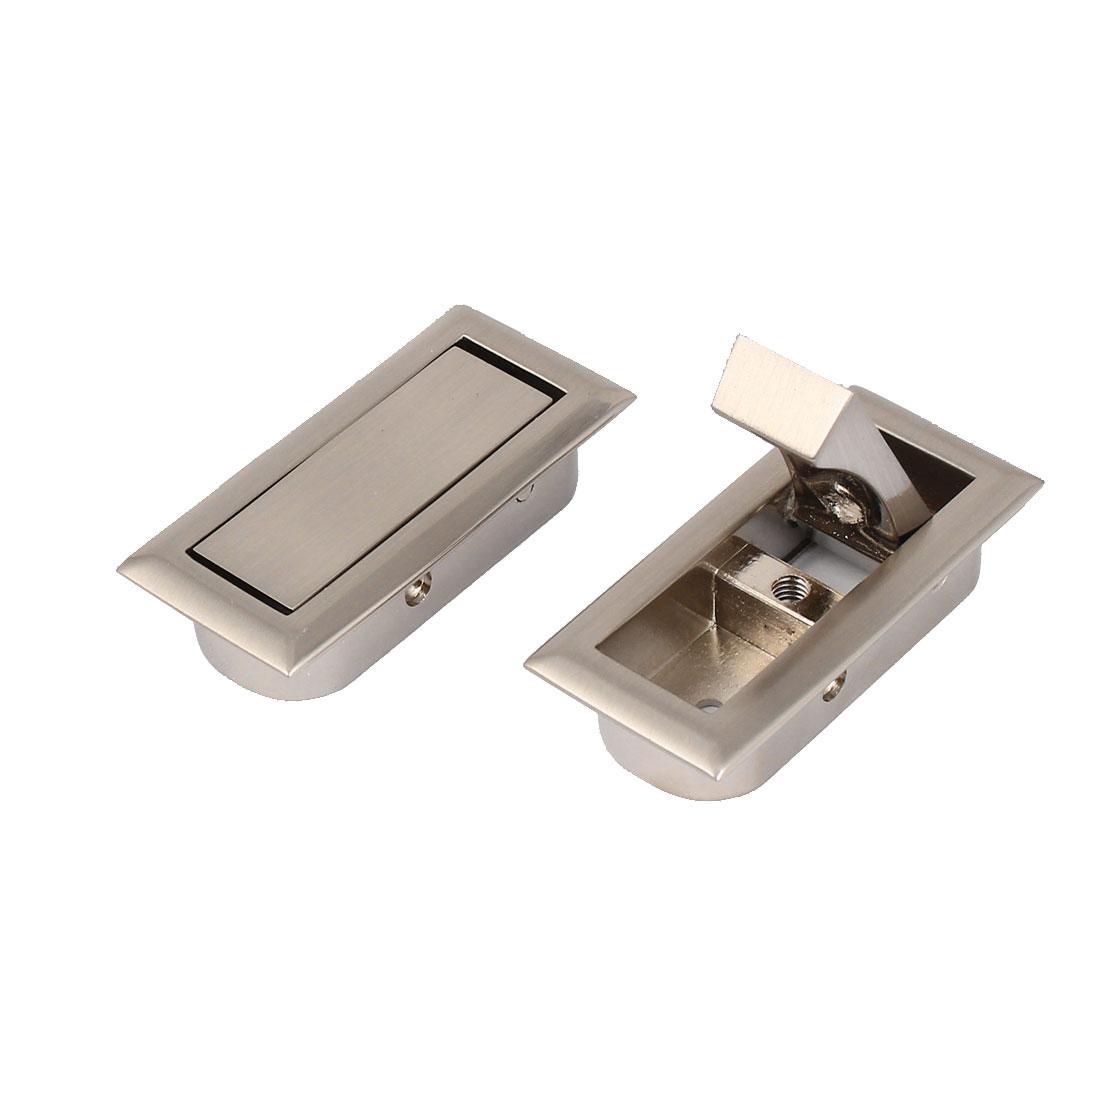 Drawer Cabinet Closet Wardrobe Recessed Zinc Alloy Pull Handle Silver Tone 2pcs